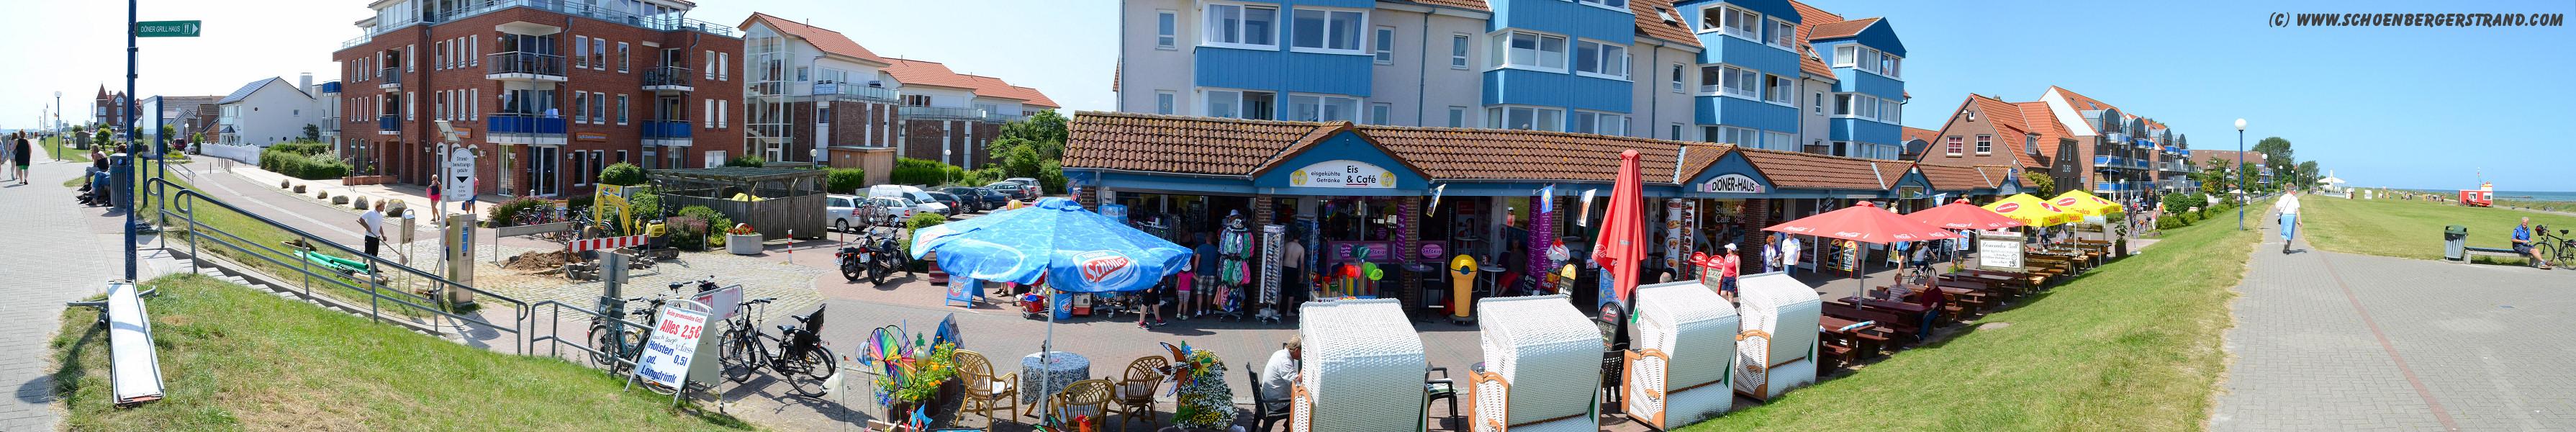 Ladenzeile an der Seebrücke Schönberger Strand I